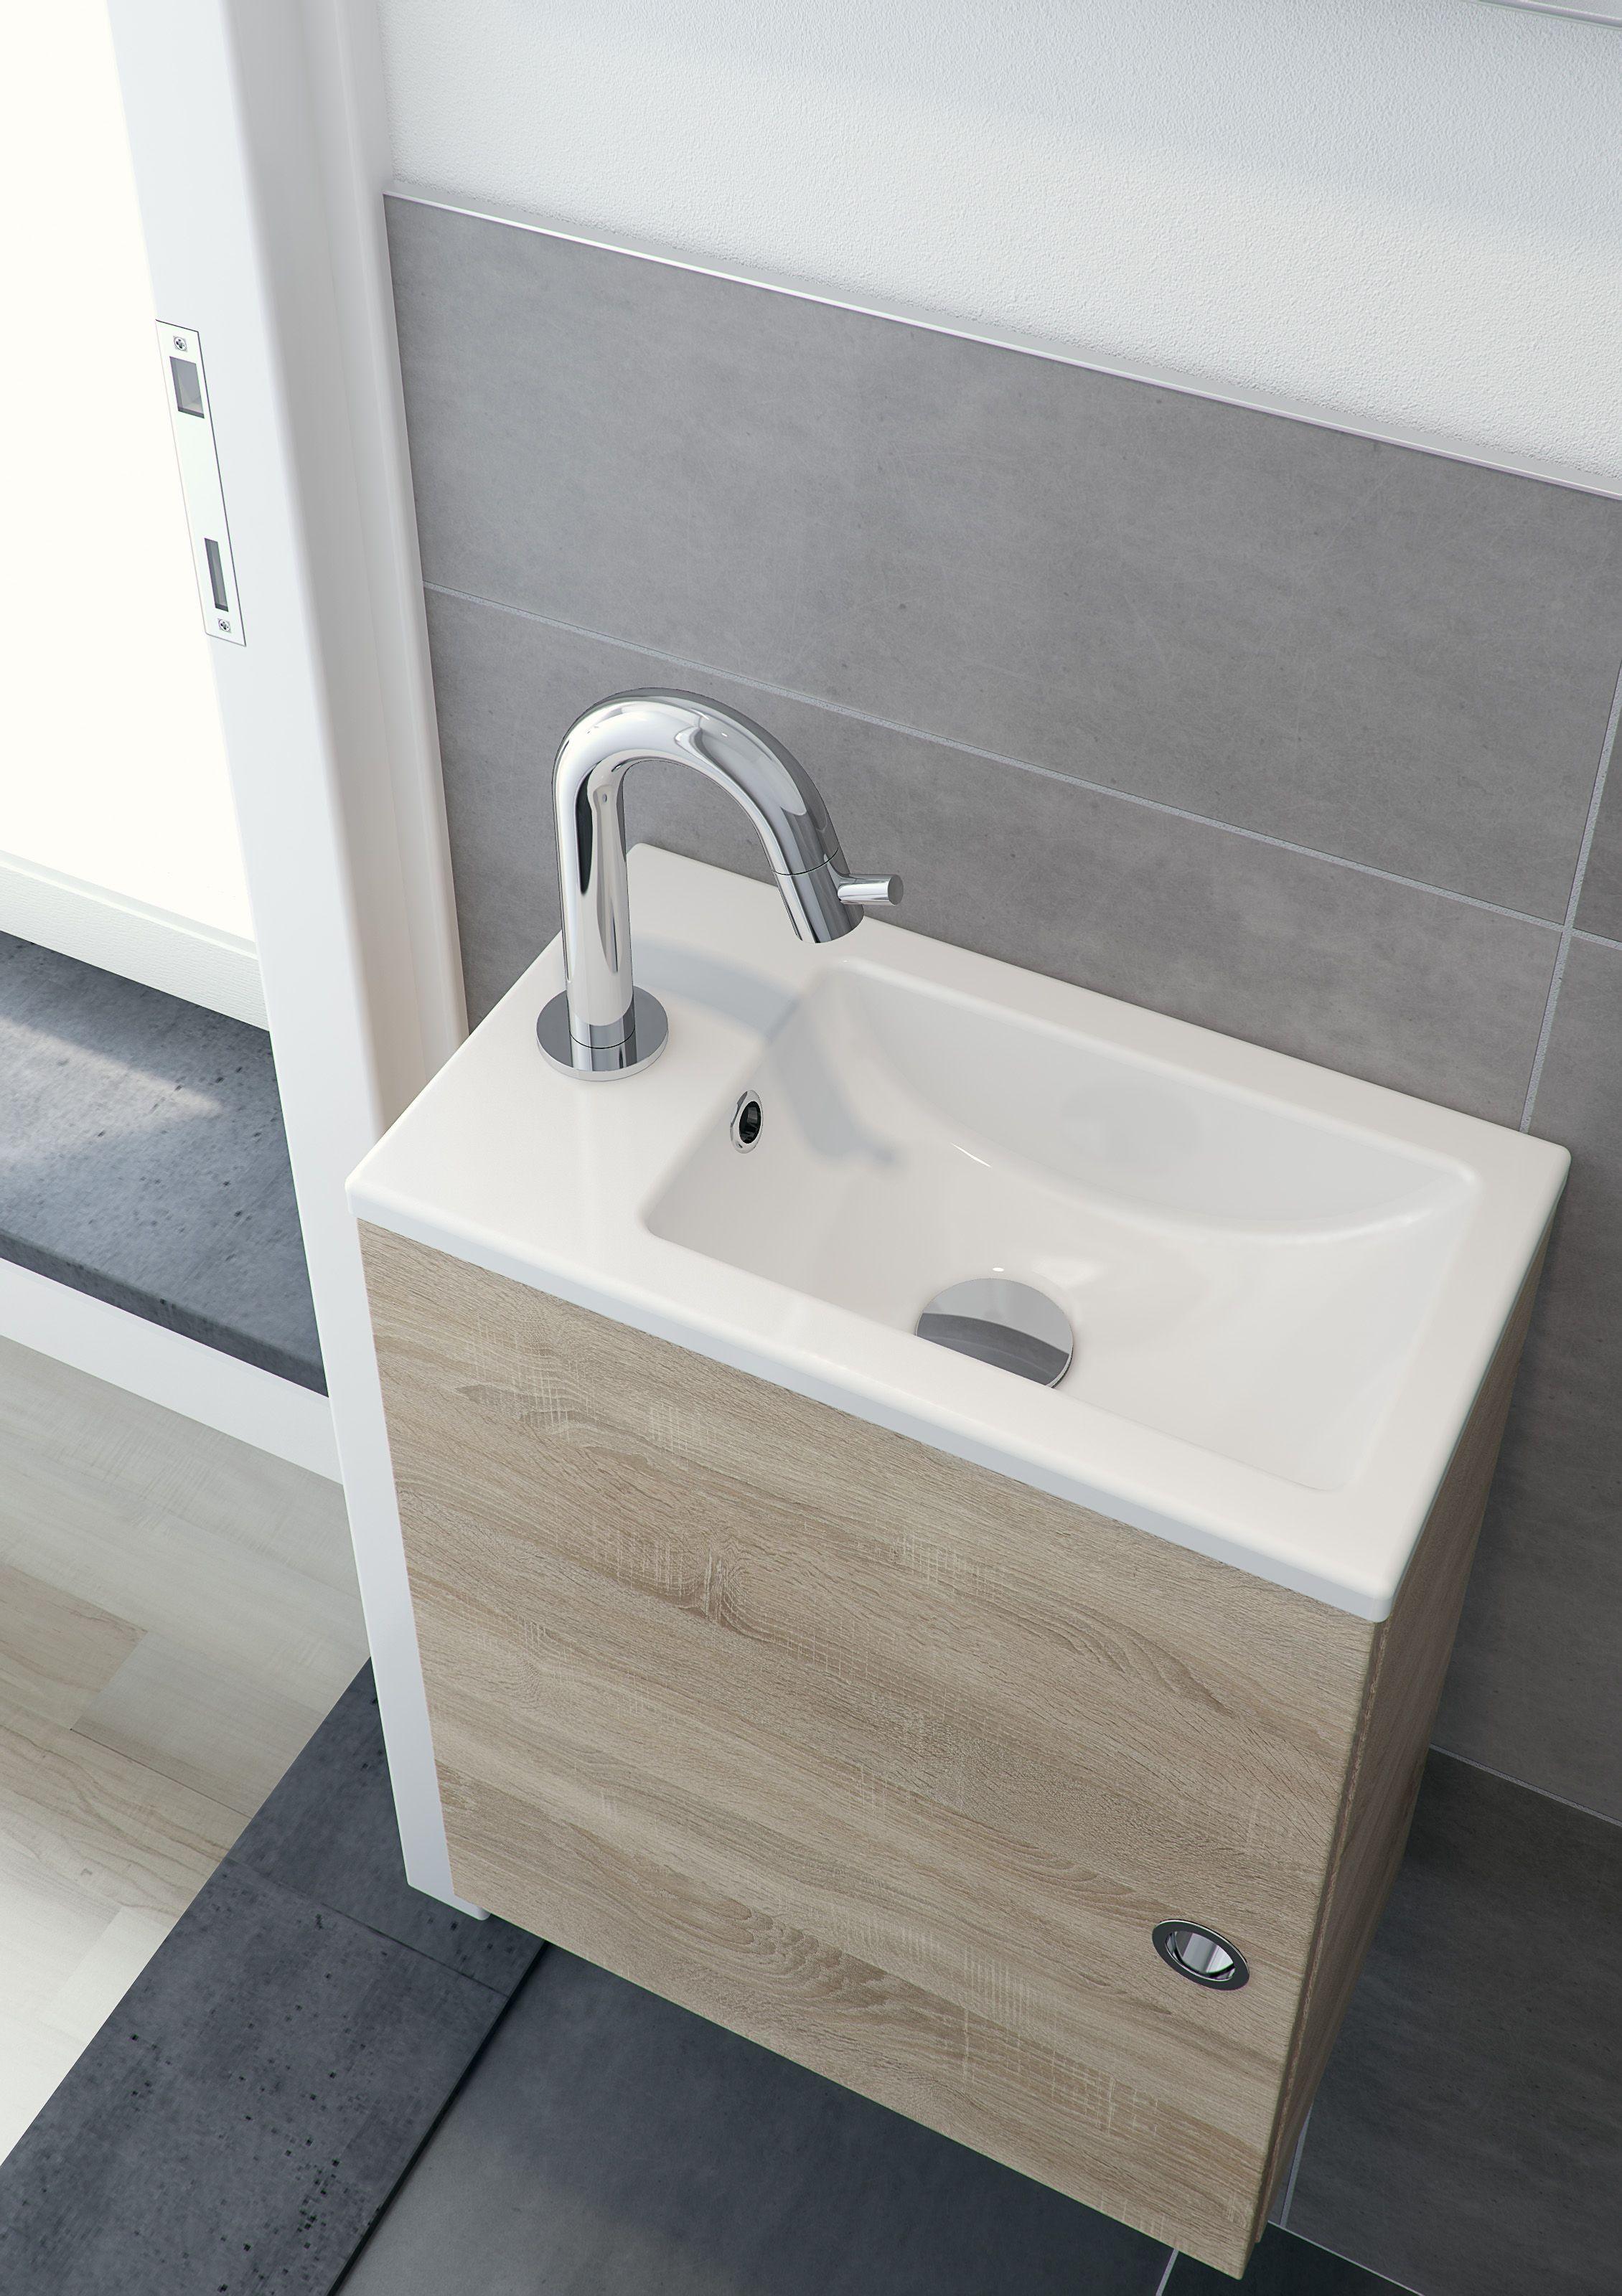 Bruynzeel Pocco fonteinmeubel 40 cm bardolino // badmeubel badkamer sanitair / bathroom furniture cabinet cloakroom washbasin / meuble salle de bain lave-mains